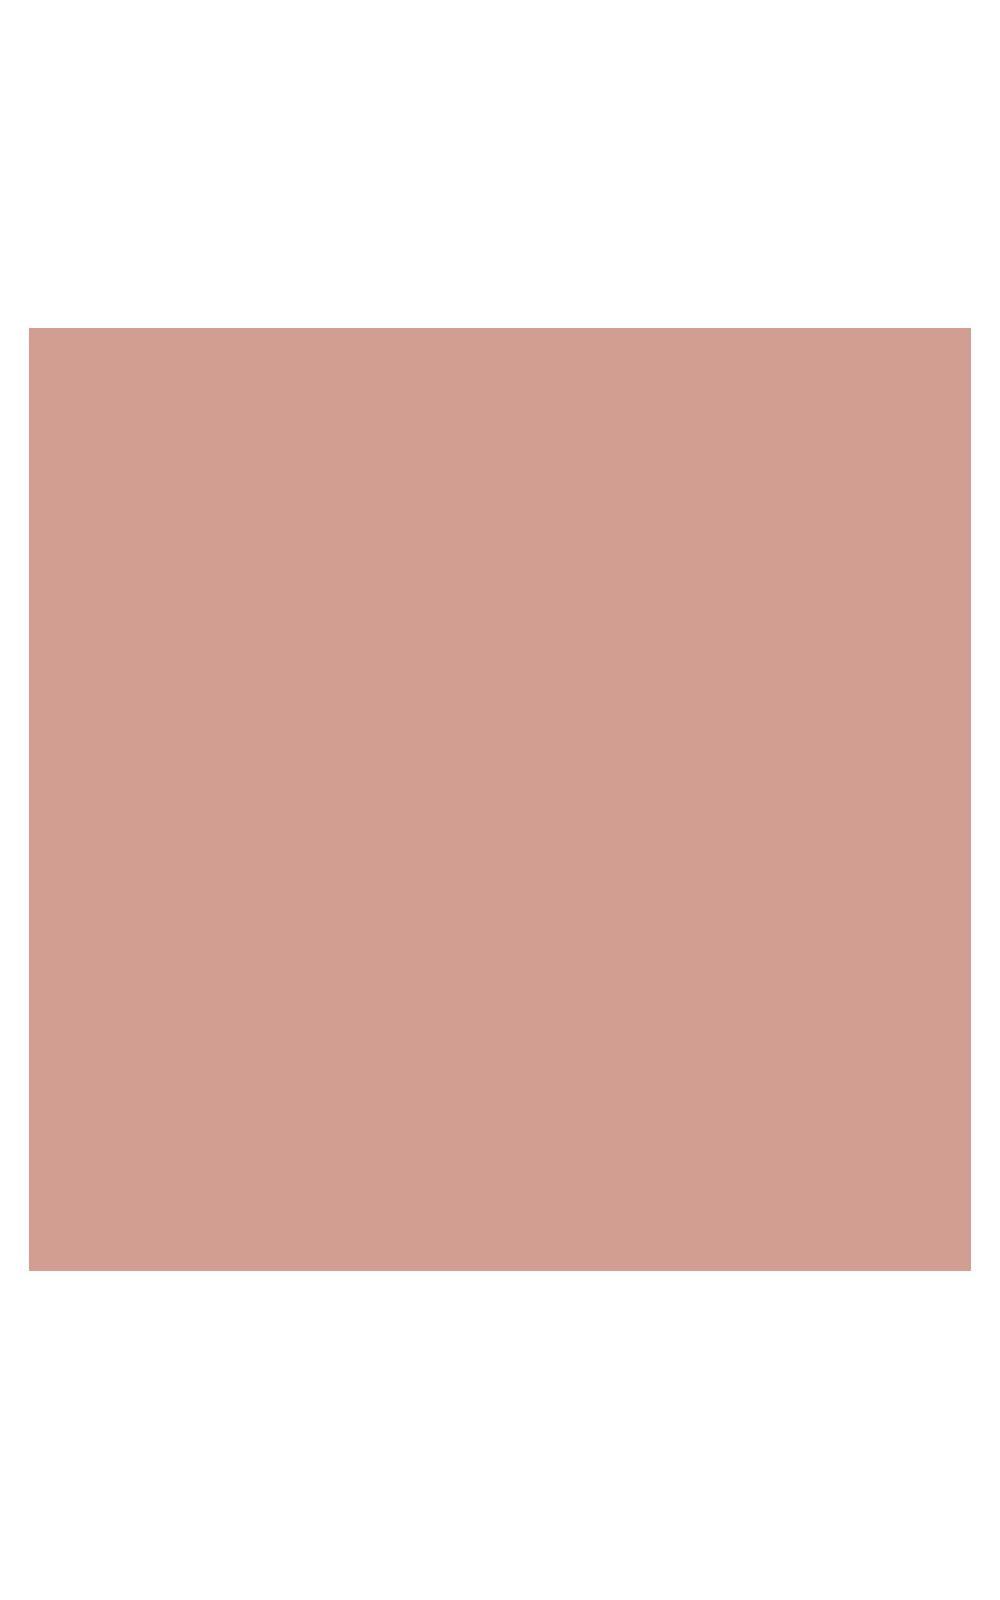 Foto 2 - Pó Compacto Catharine Hill Pressed Powder Micronizado - Rose Gold - Rose Gold